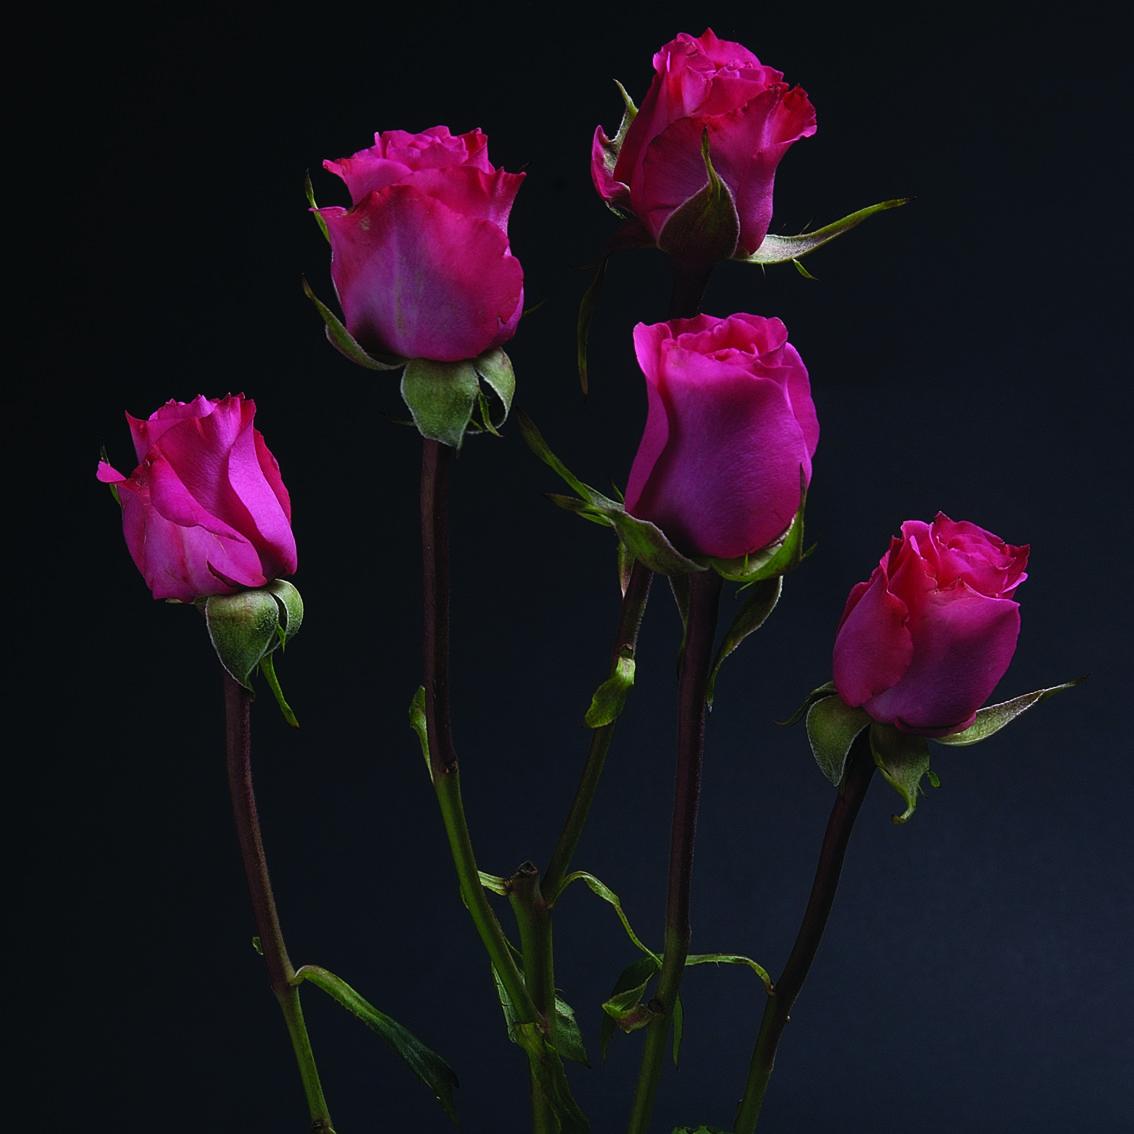 Twinkle Bride #RosesColombia #RedilRoses #ColombianFlowers #Roses #BlomFlores #Regalos